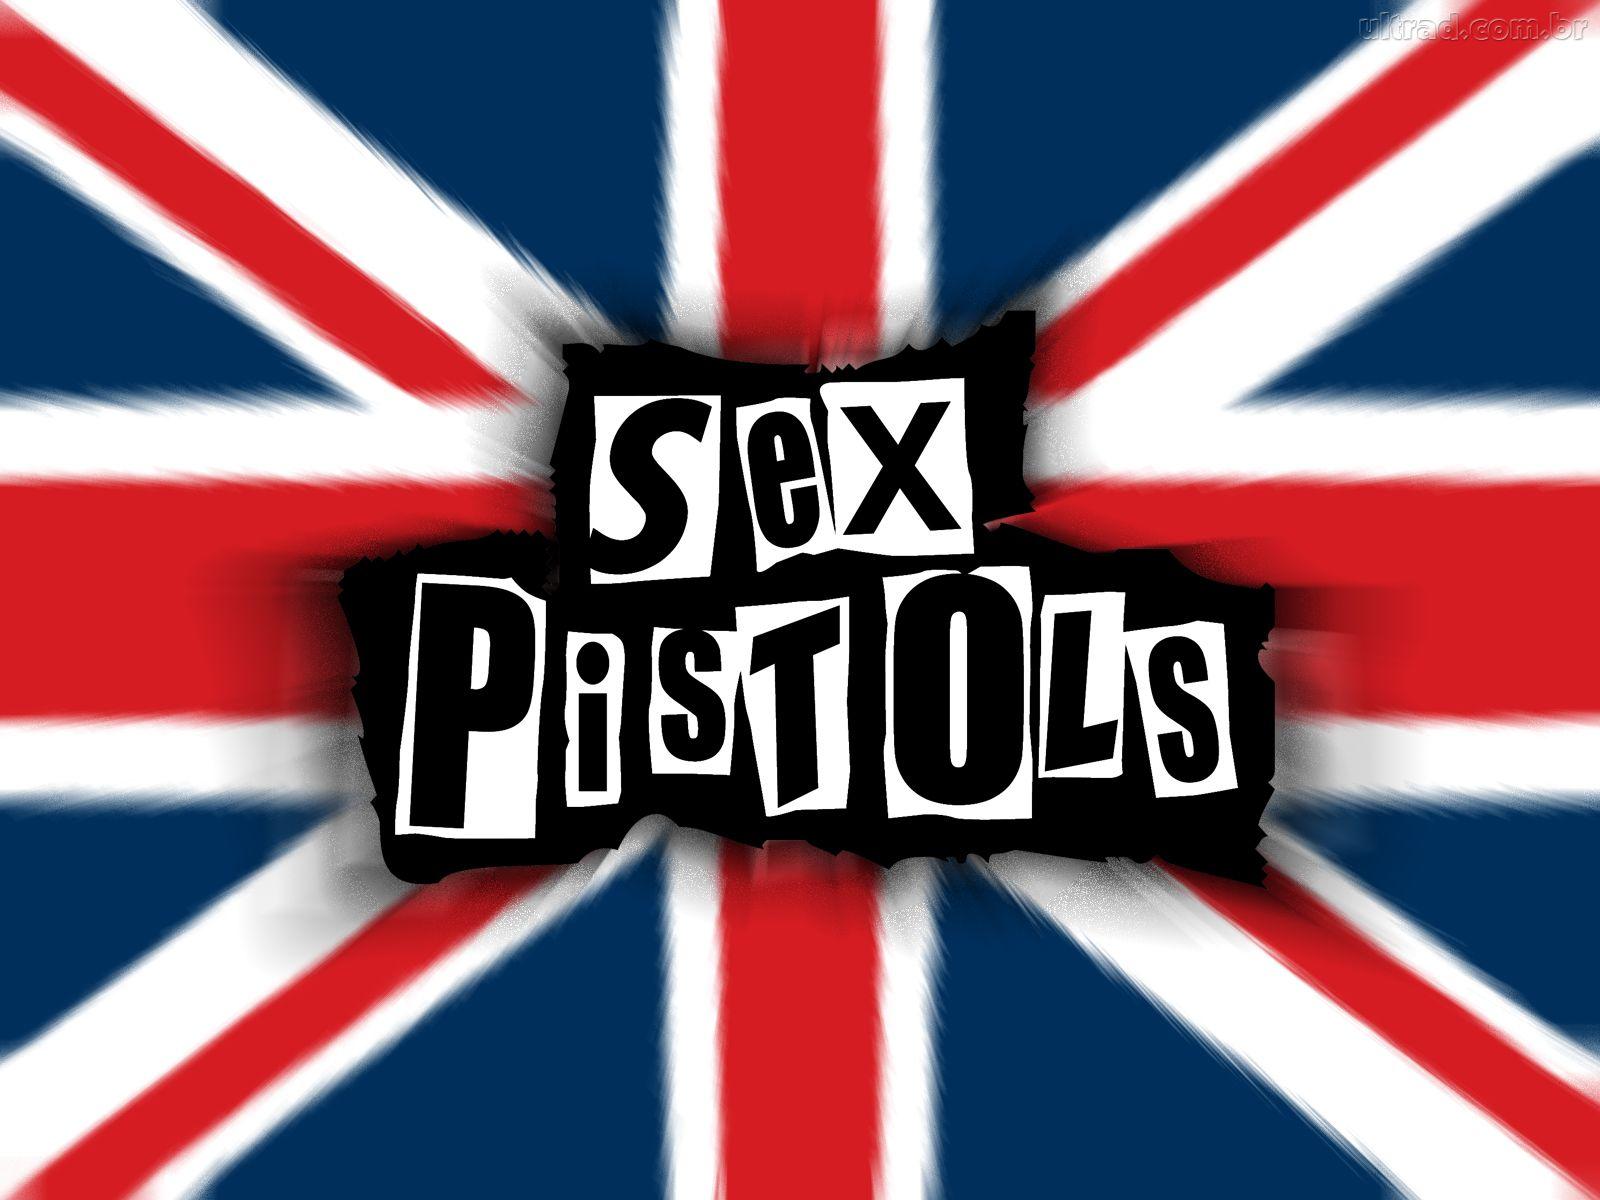 Sex Pistils 118